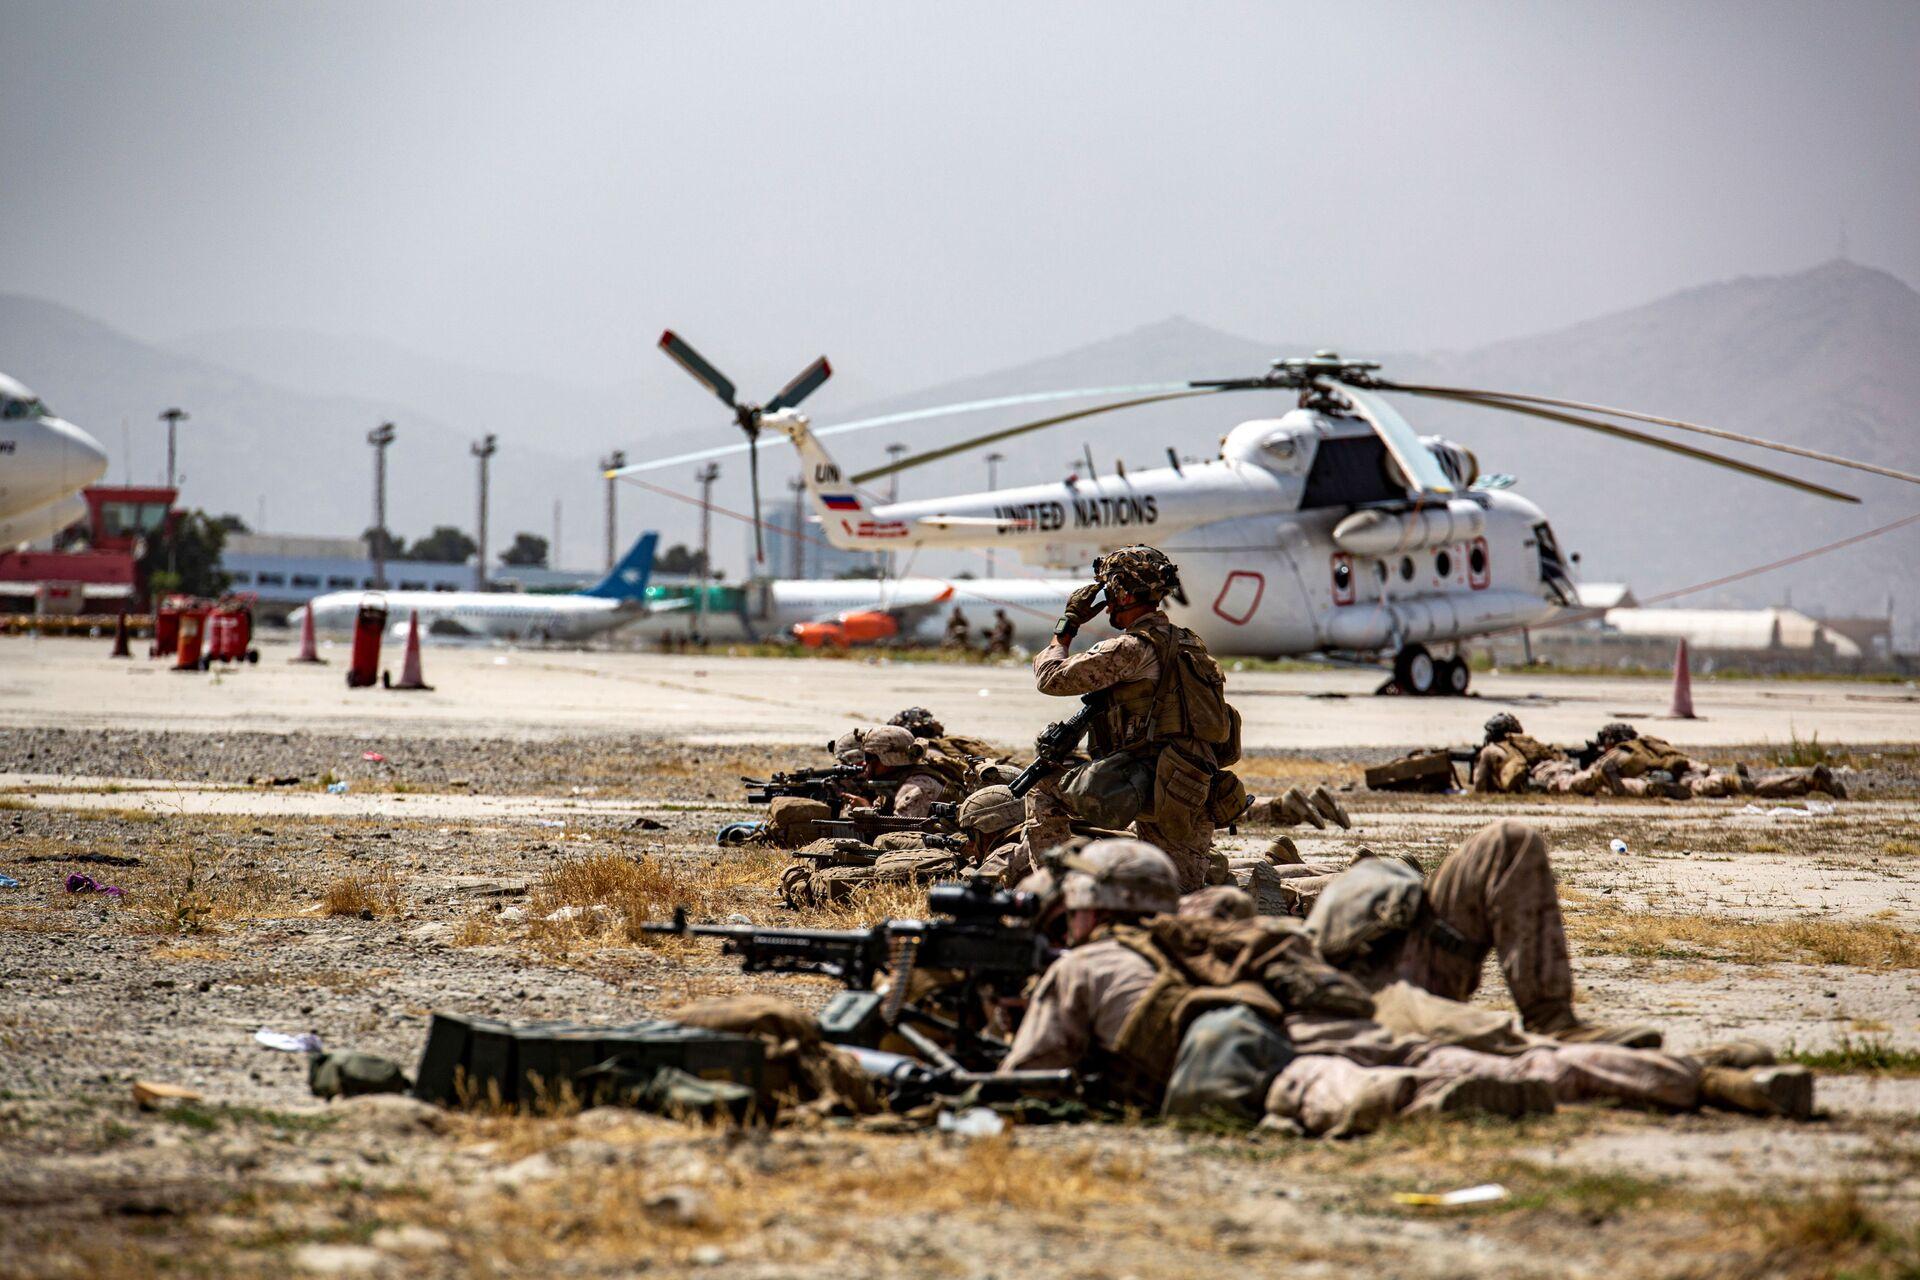 US Marines keep watch during an evacuation at Hamid Karzai International Airport, Kabul, Afghanistan, August 18, 2021 - Sputnik International, 1920, 07.09.2021